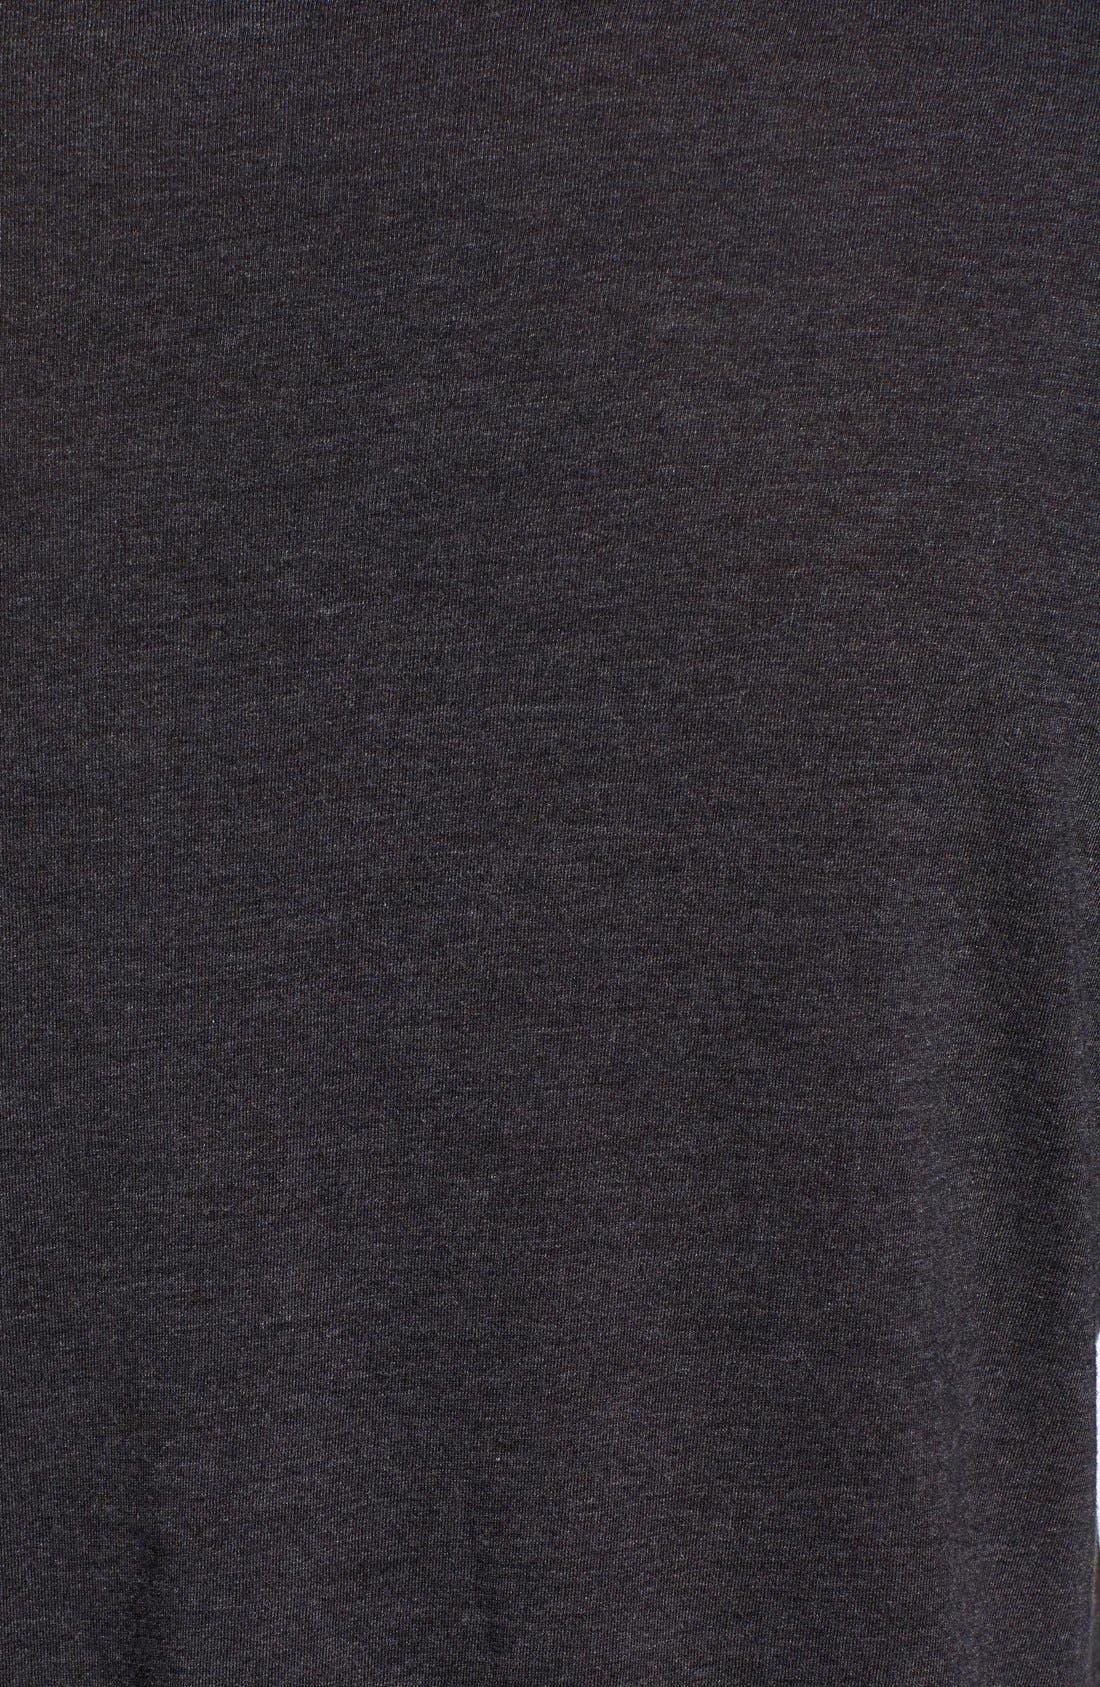 Knit Henley,                             Alternate thumbnail 5, color,                             028